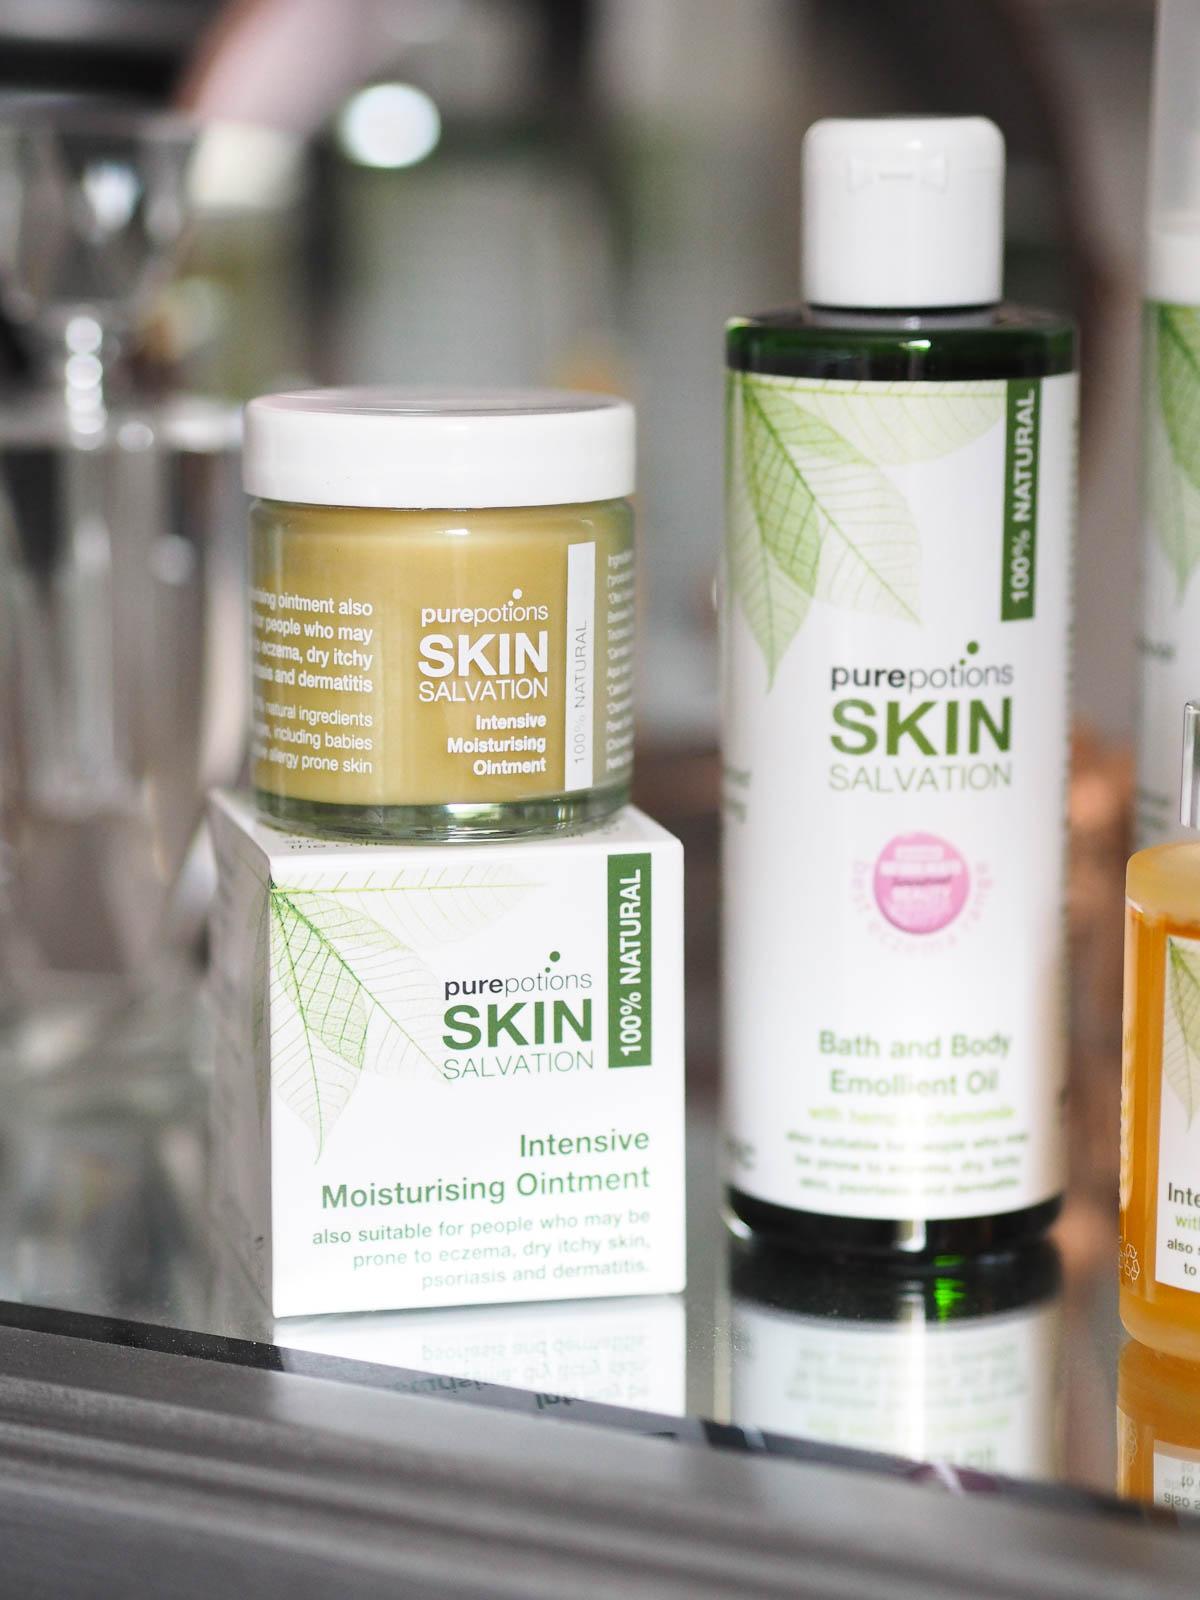 Award-Winning Skin Salvation Skin Care From Purepotions